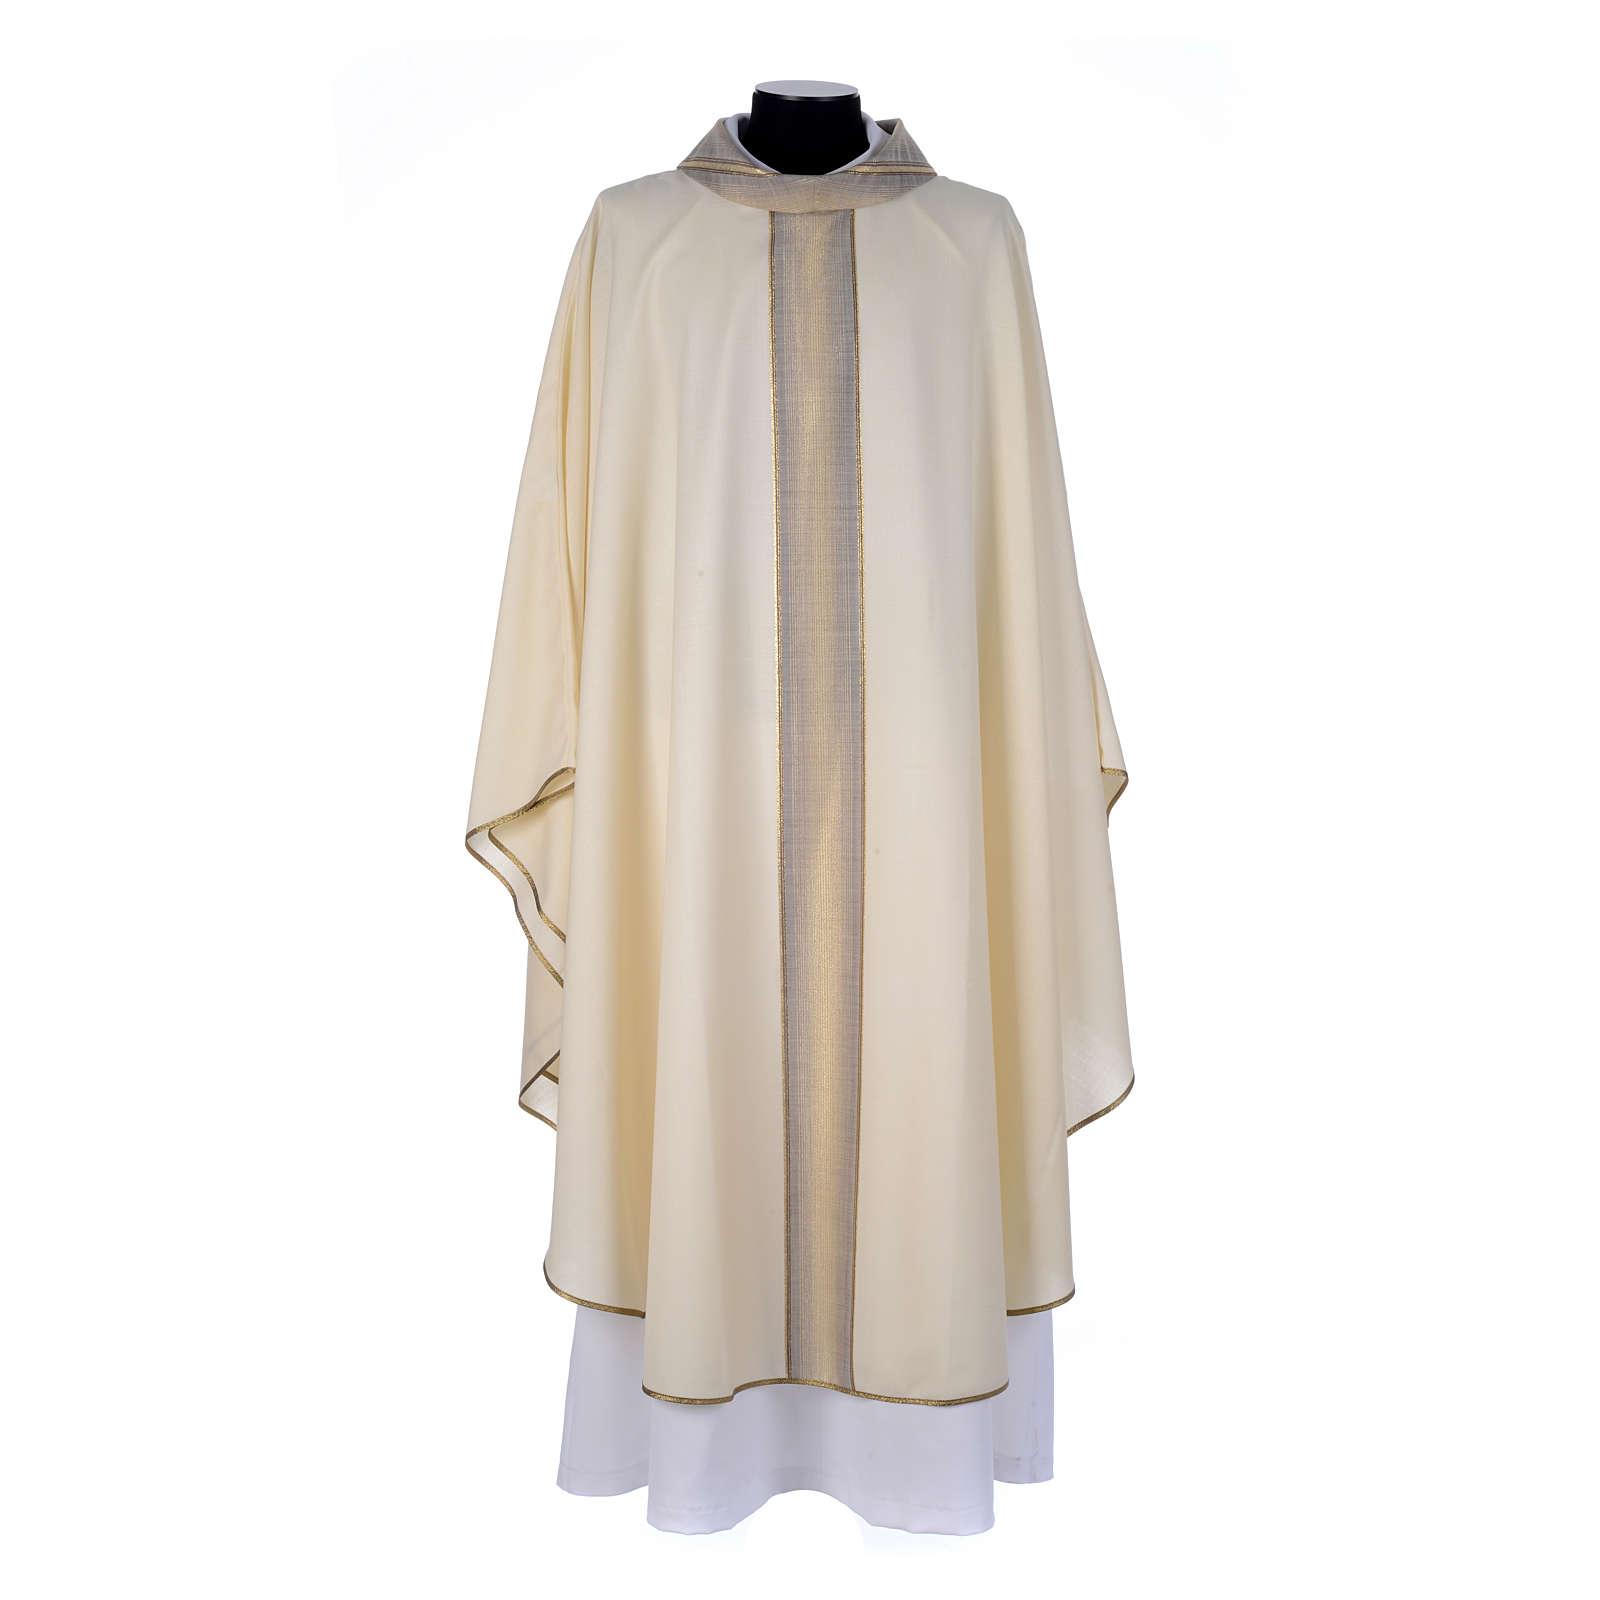 Casula in pura lana leggerissima 4